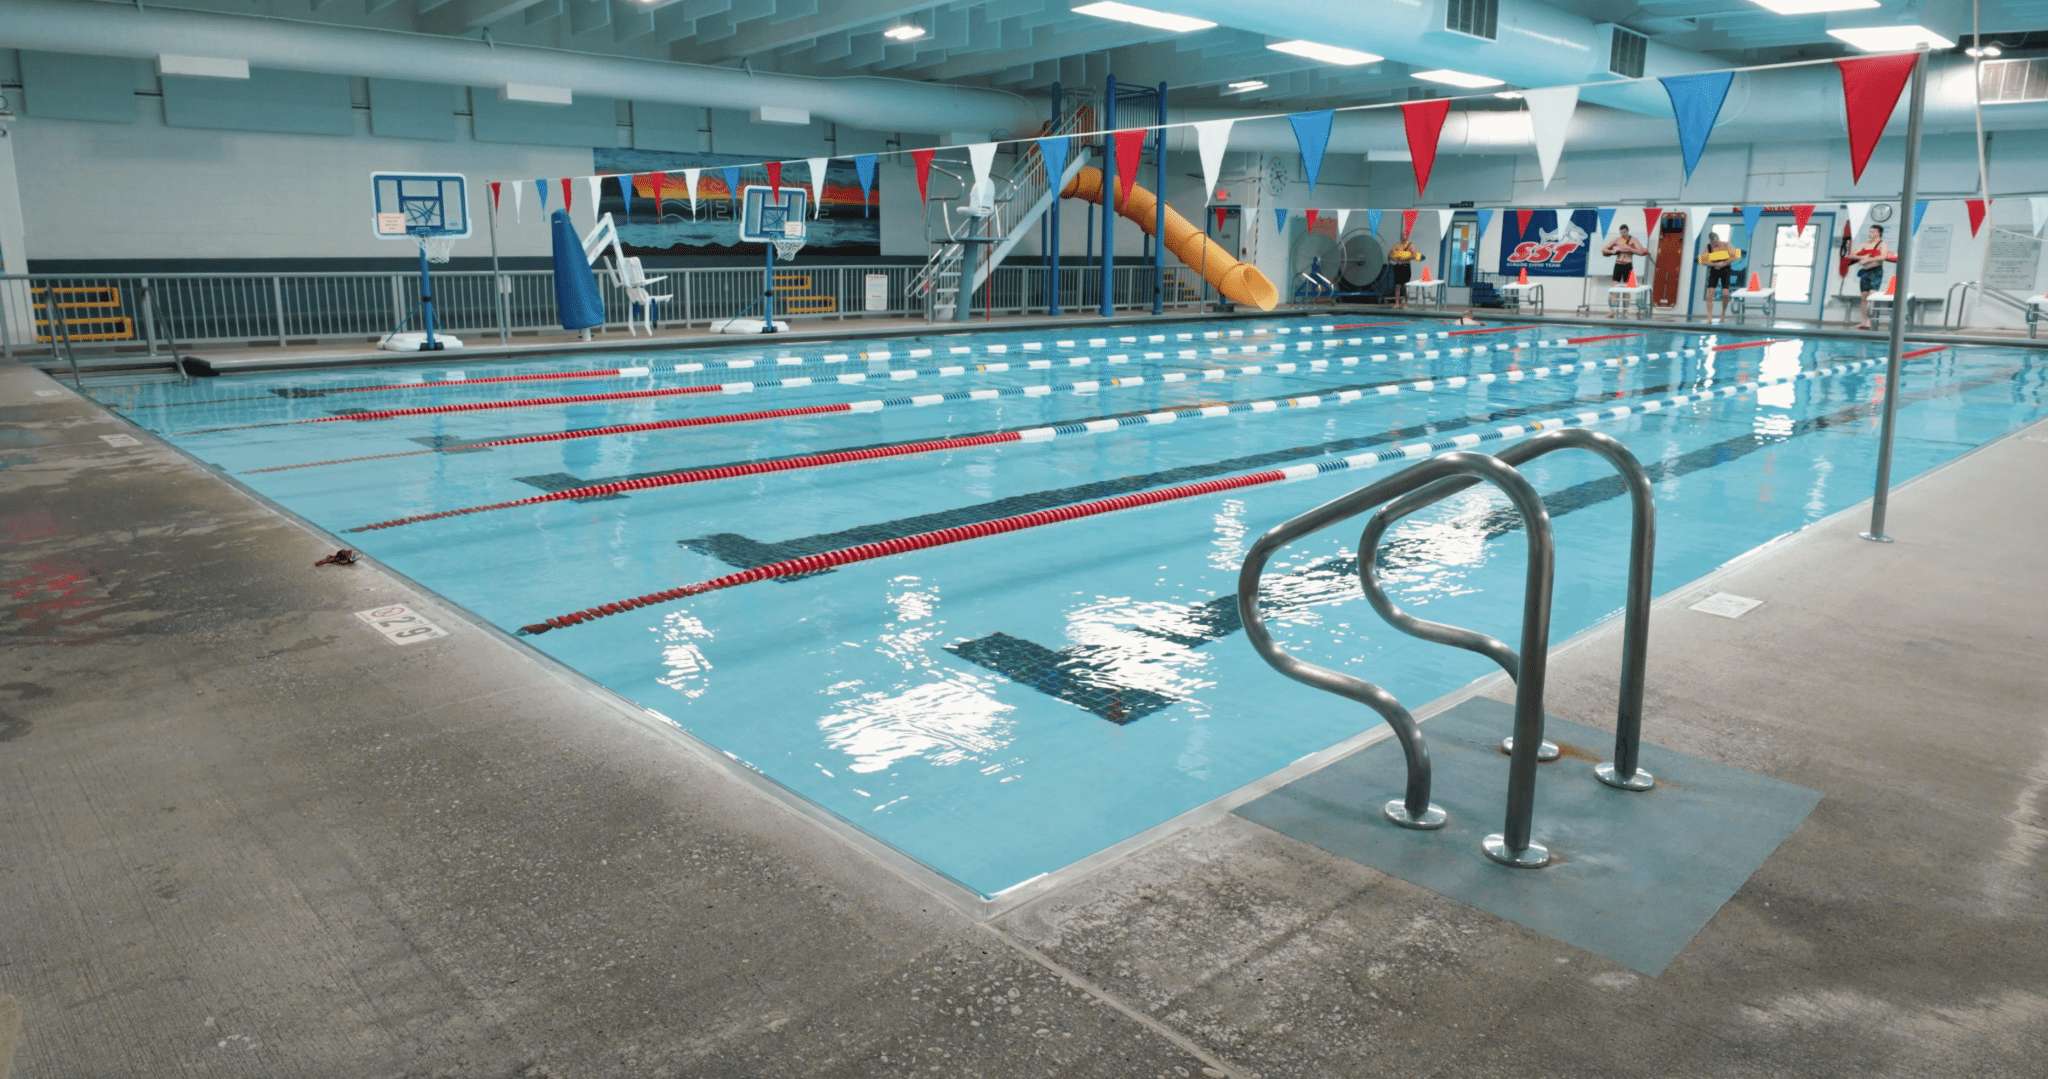 Oregon Swimming Pool: Three Pools Recreation Area A